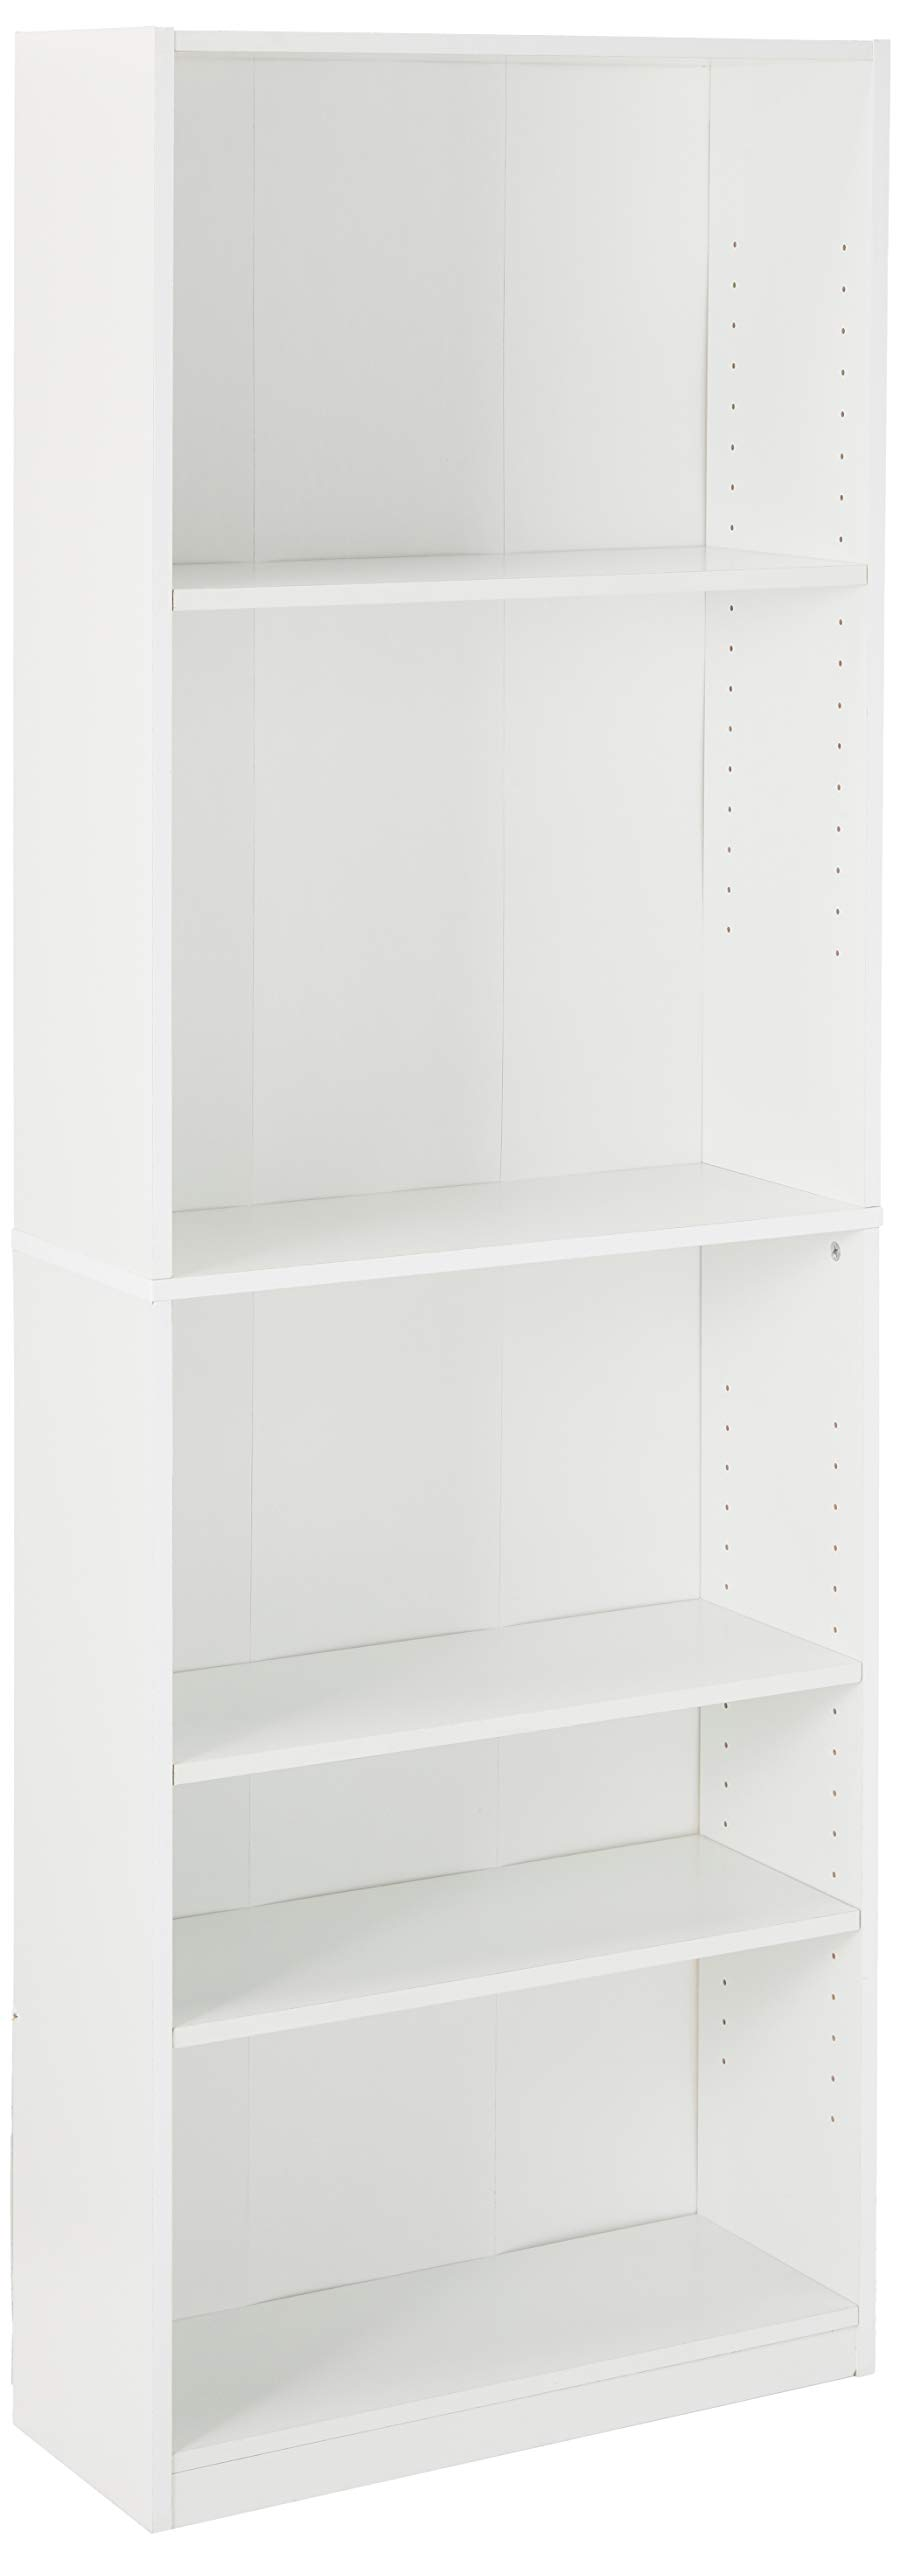 Furinno Jaya Simple Home 5-Shelf Bookcase, White by Furinno